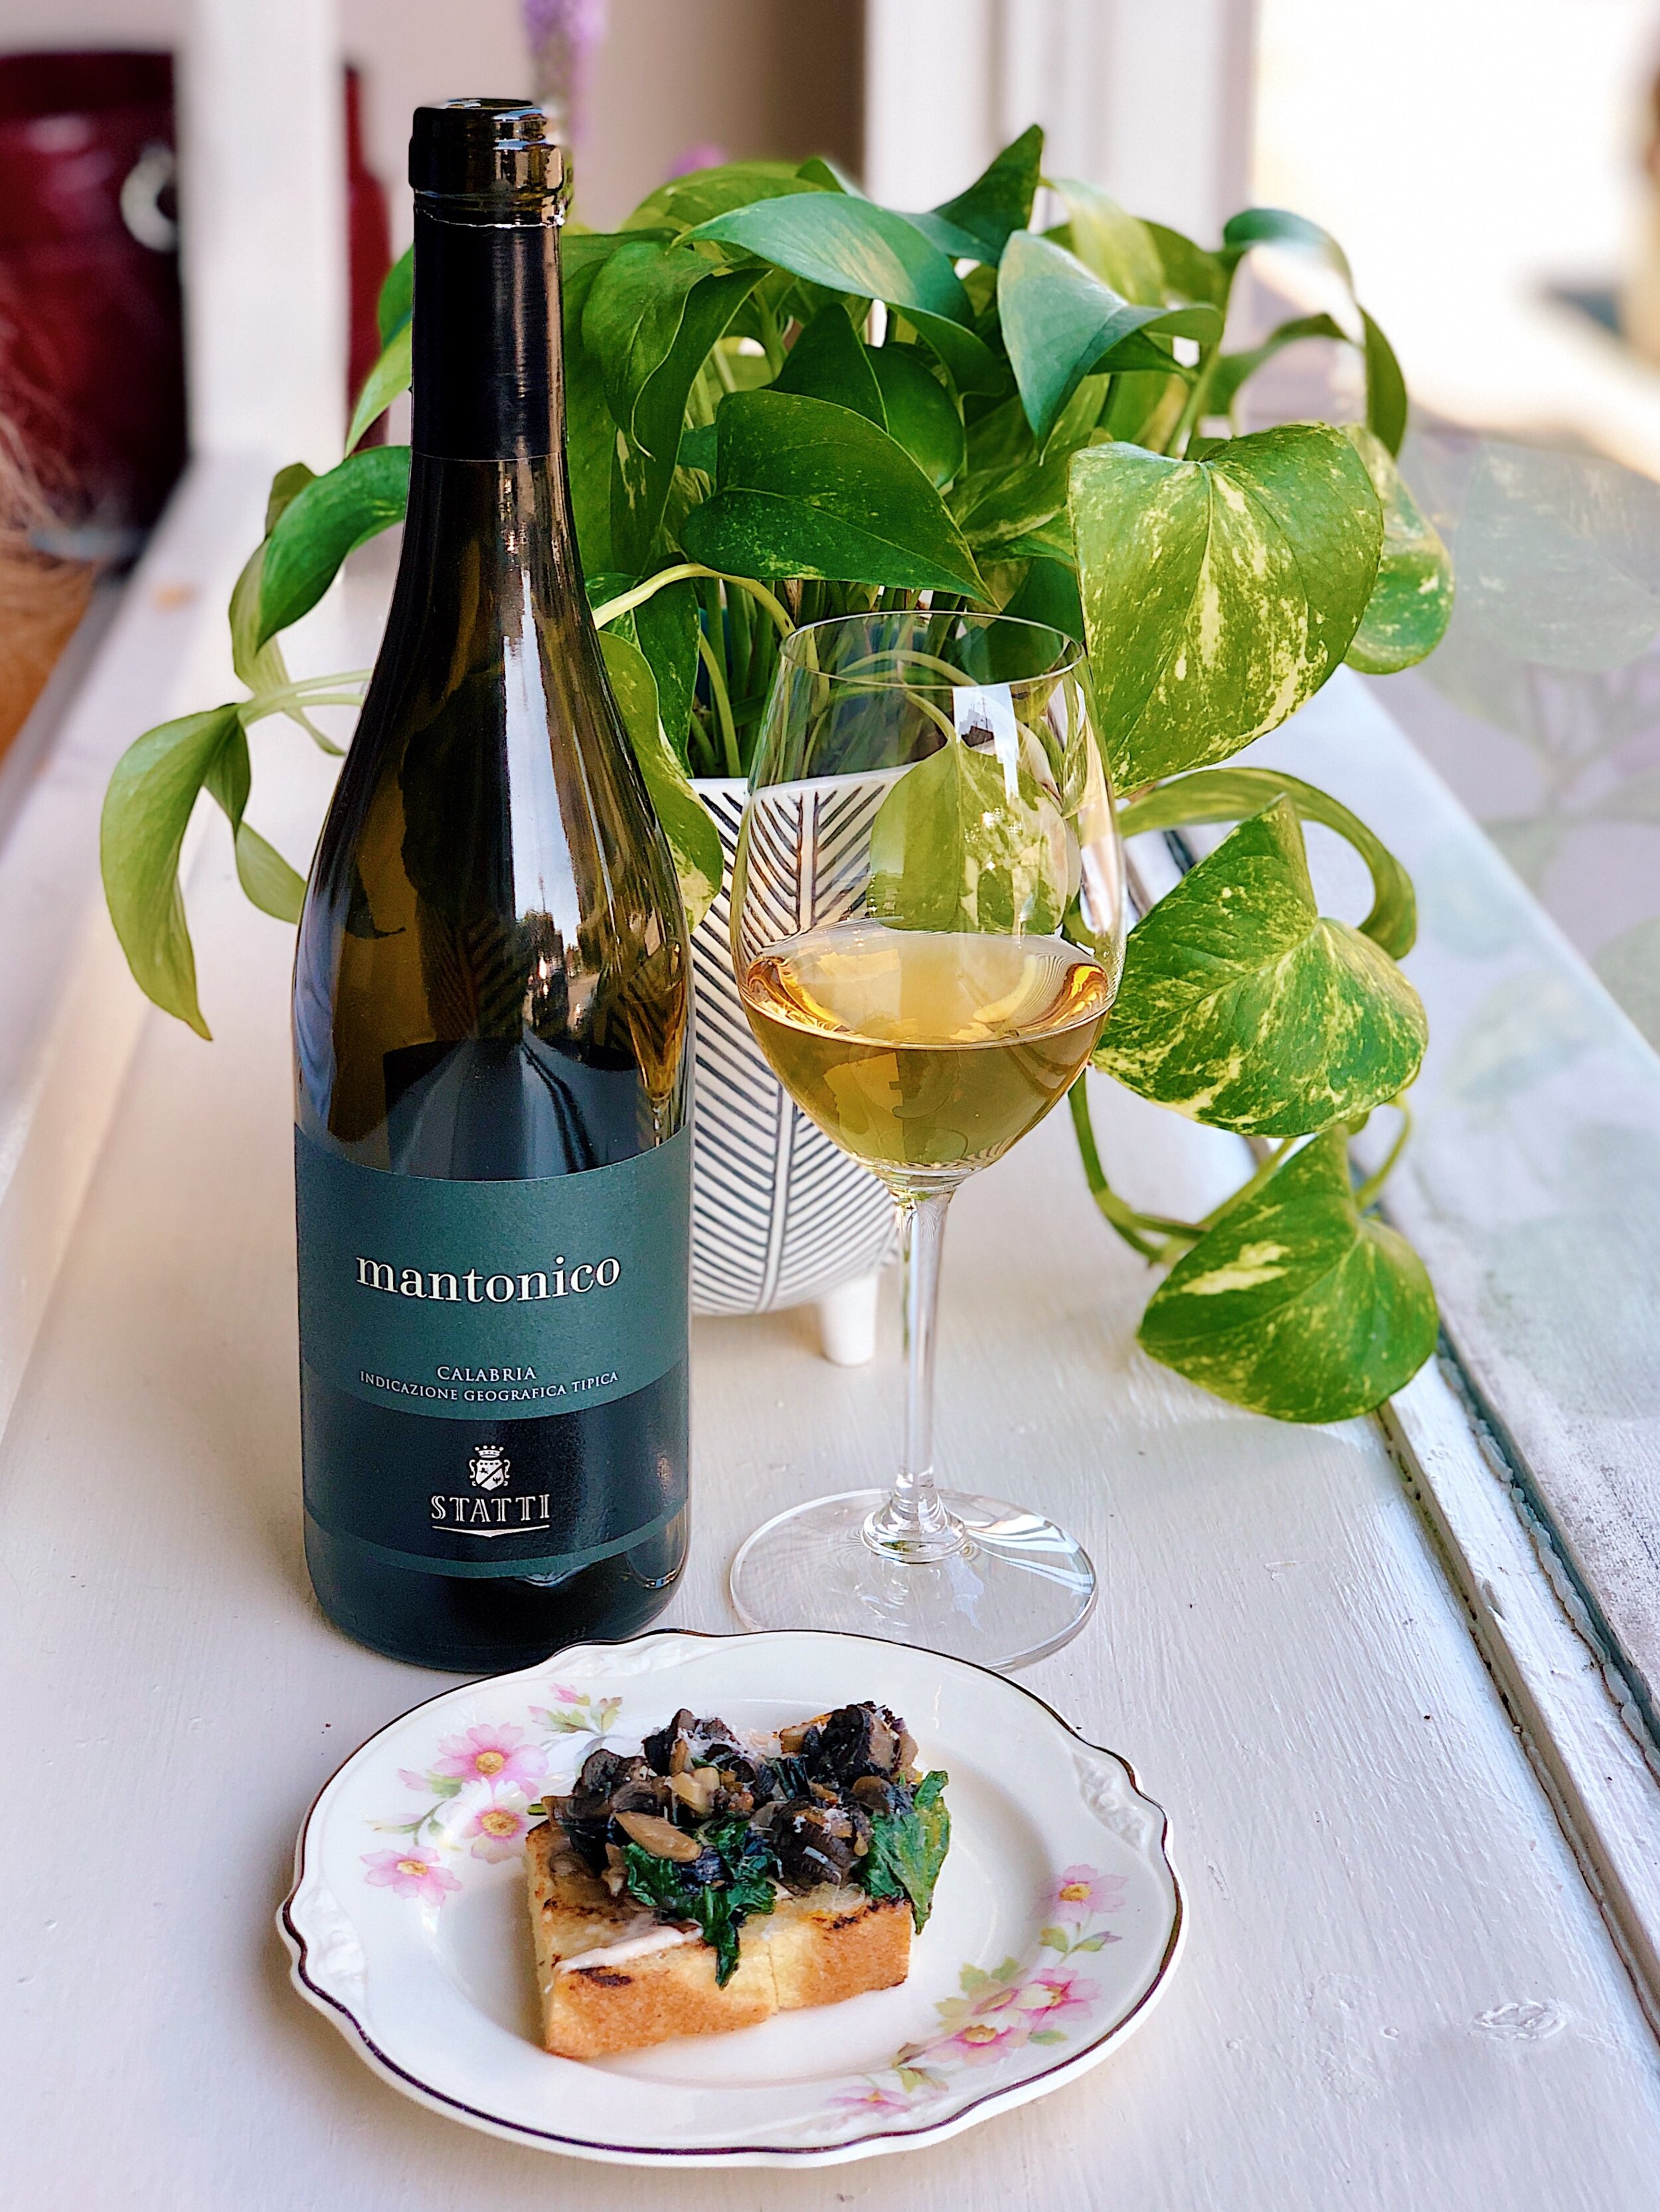 wine_wise_events_wine_food_walk_winewalk_whitw_italian_piccolo_italy.jpg